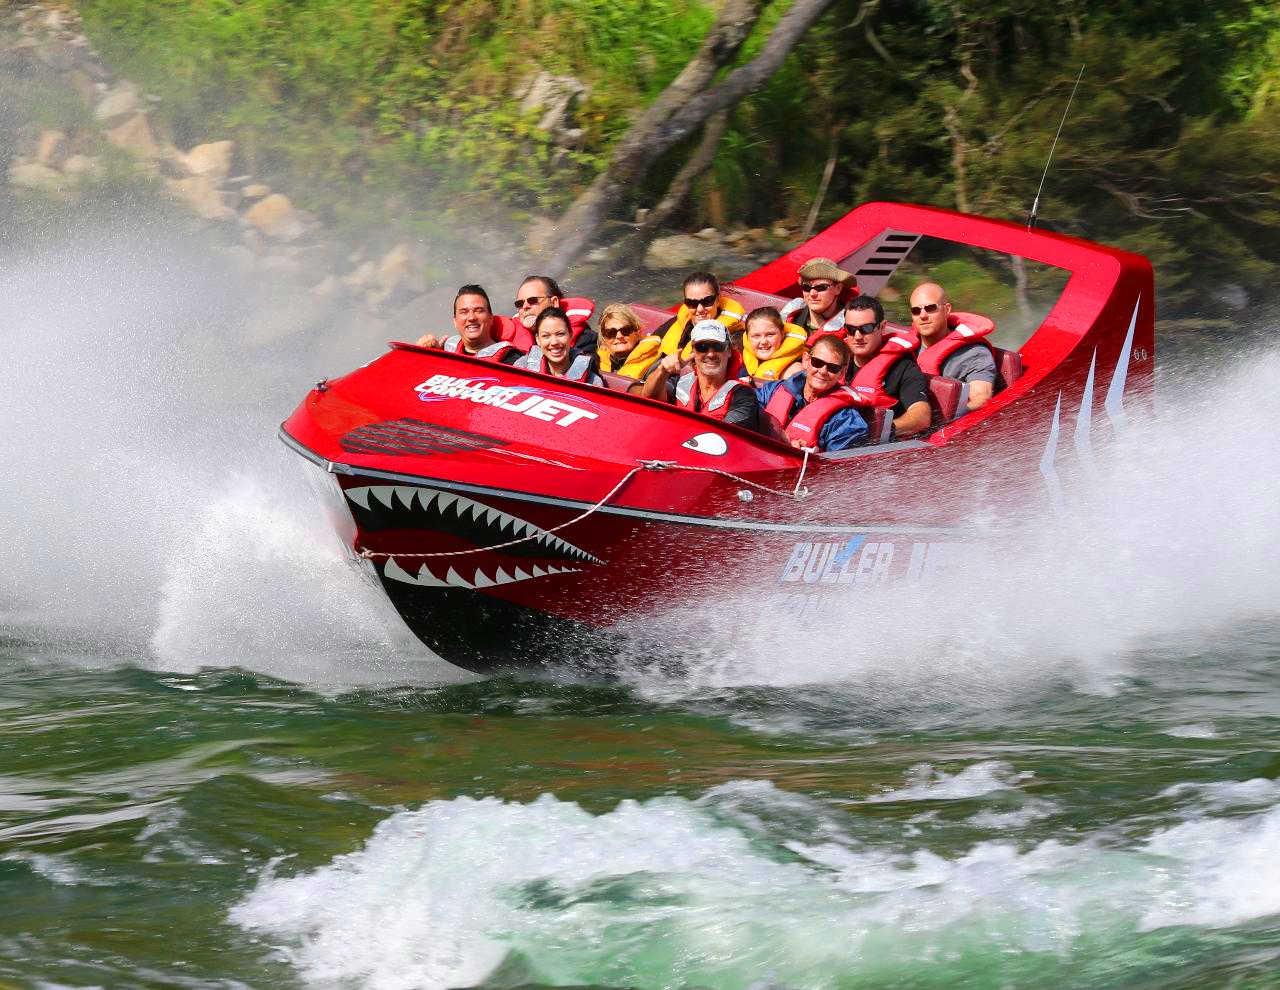 Buller Canyon Jet Ride,New Zealand @Buller Canyon Jet Reservations